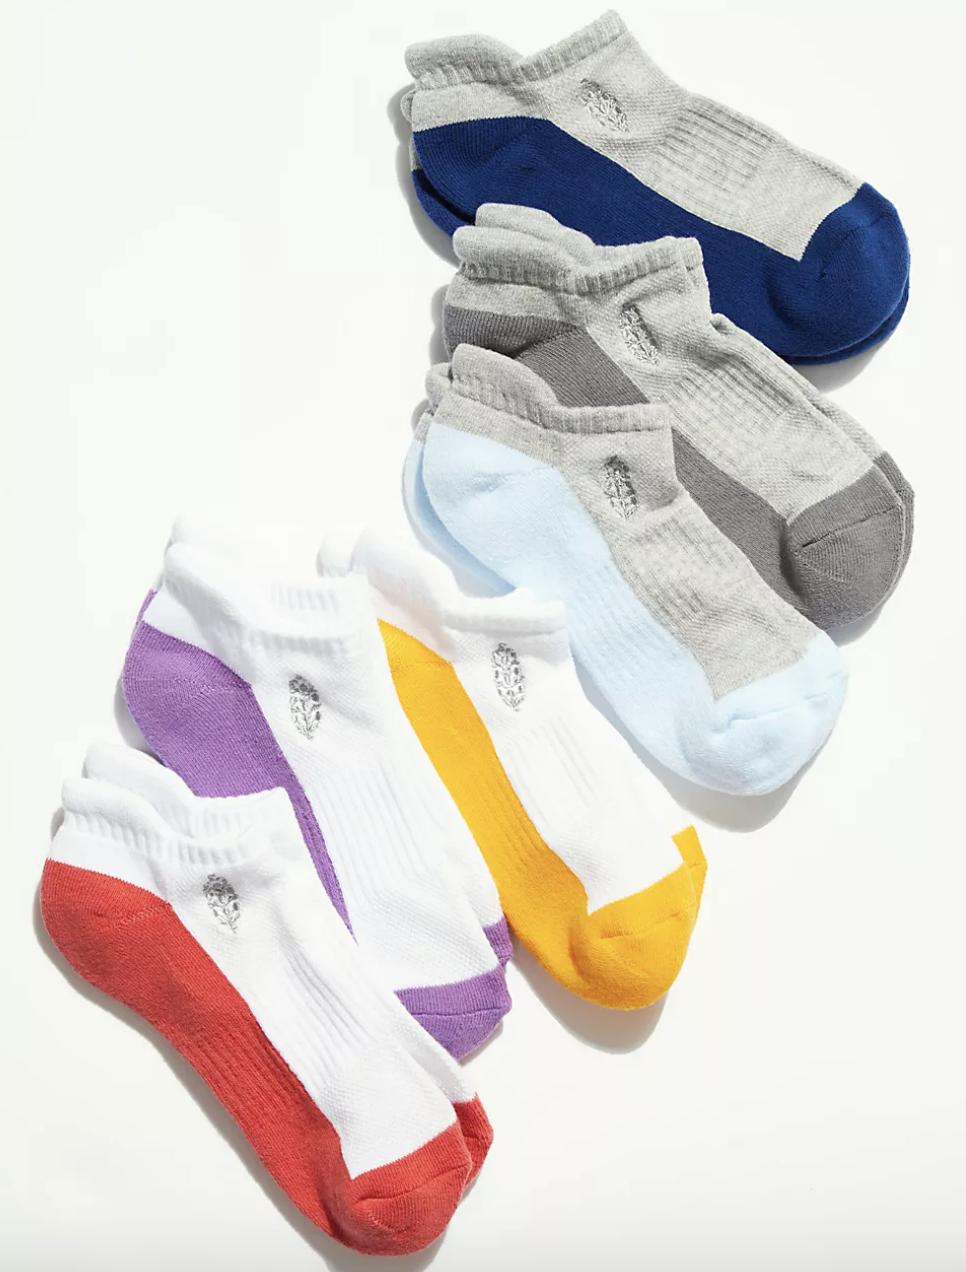 the multi-colored socks